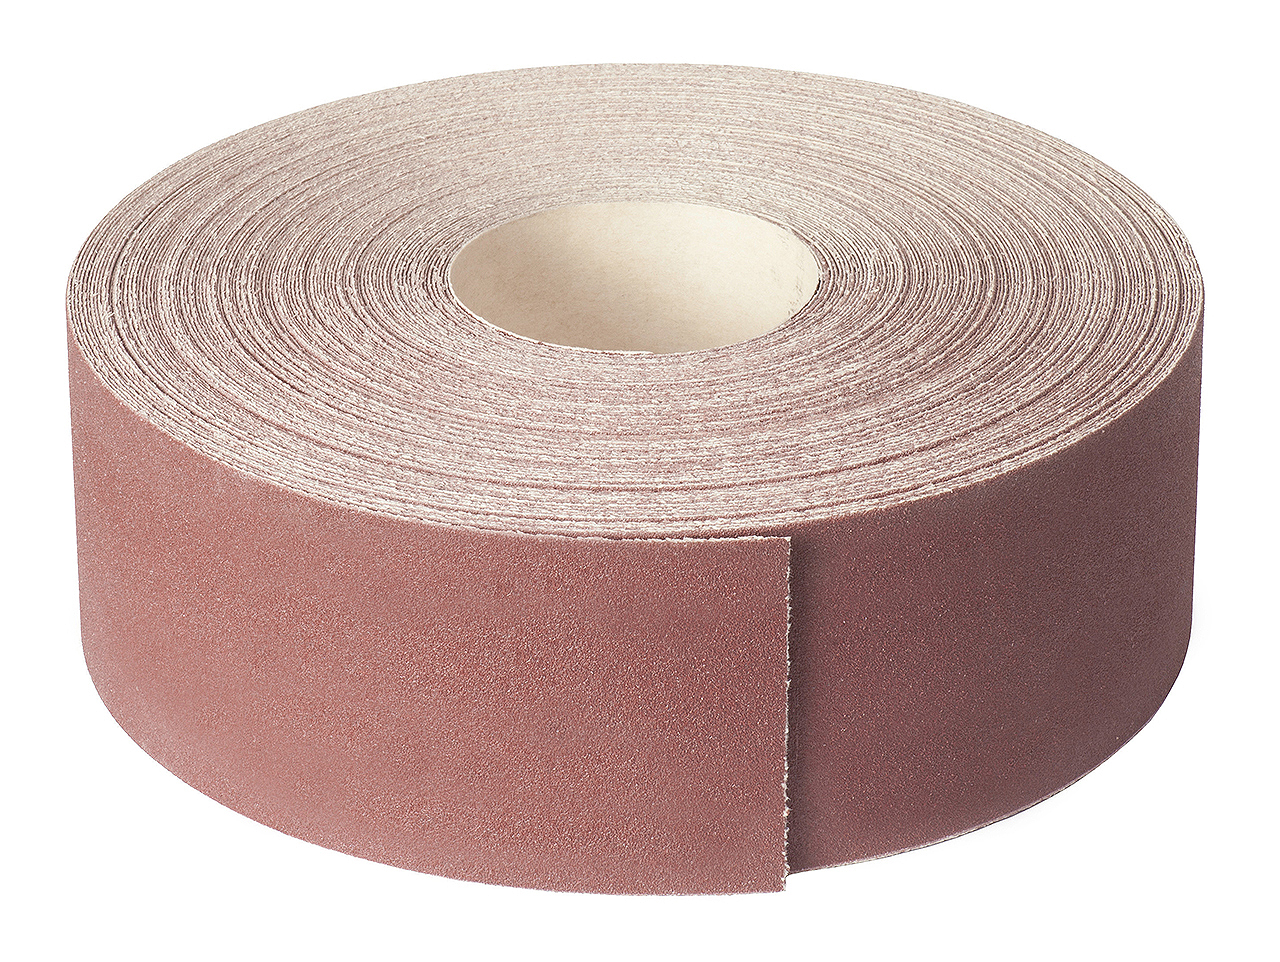 Image of   Sanding belt roll 50 m - grit 100